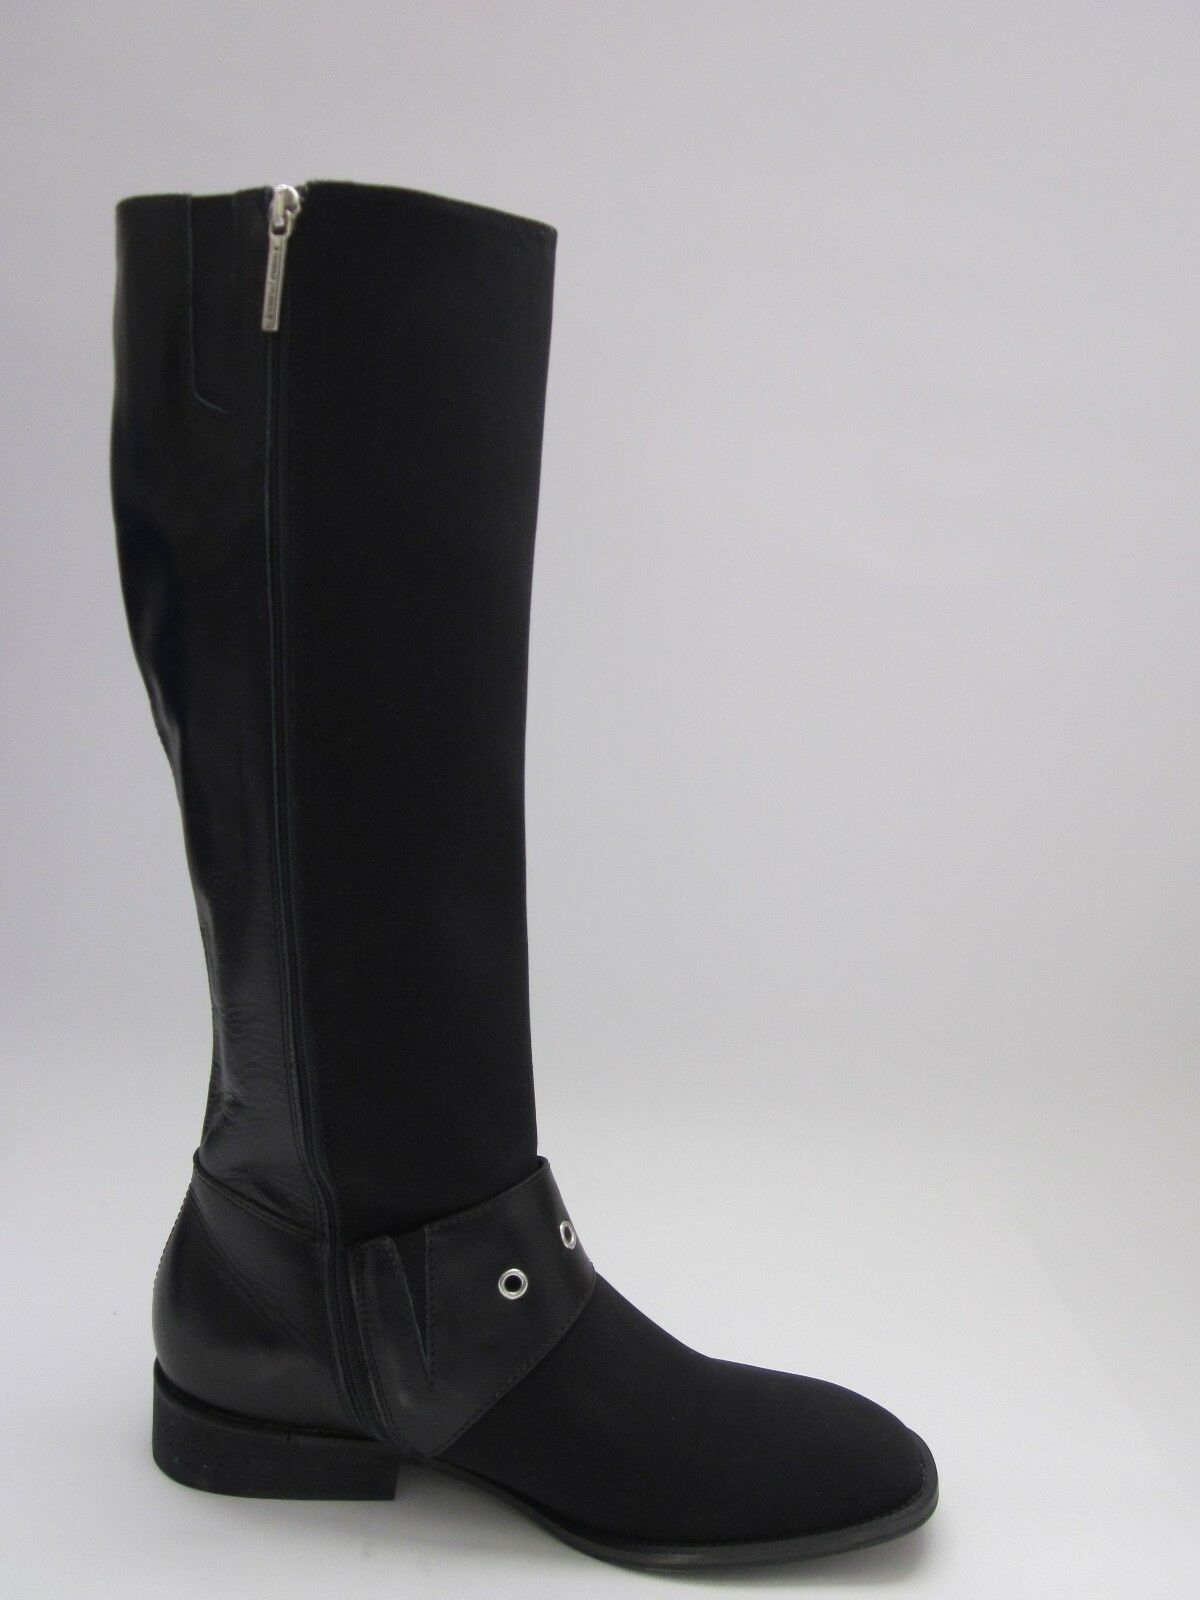 Donald J. Pliner Gale Knee-High Boots Black Black Black Crepe Elastic Women's 6 6c0a55